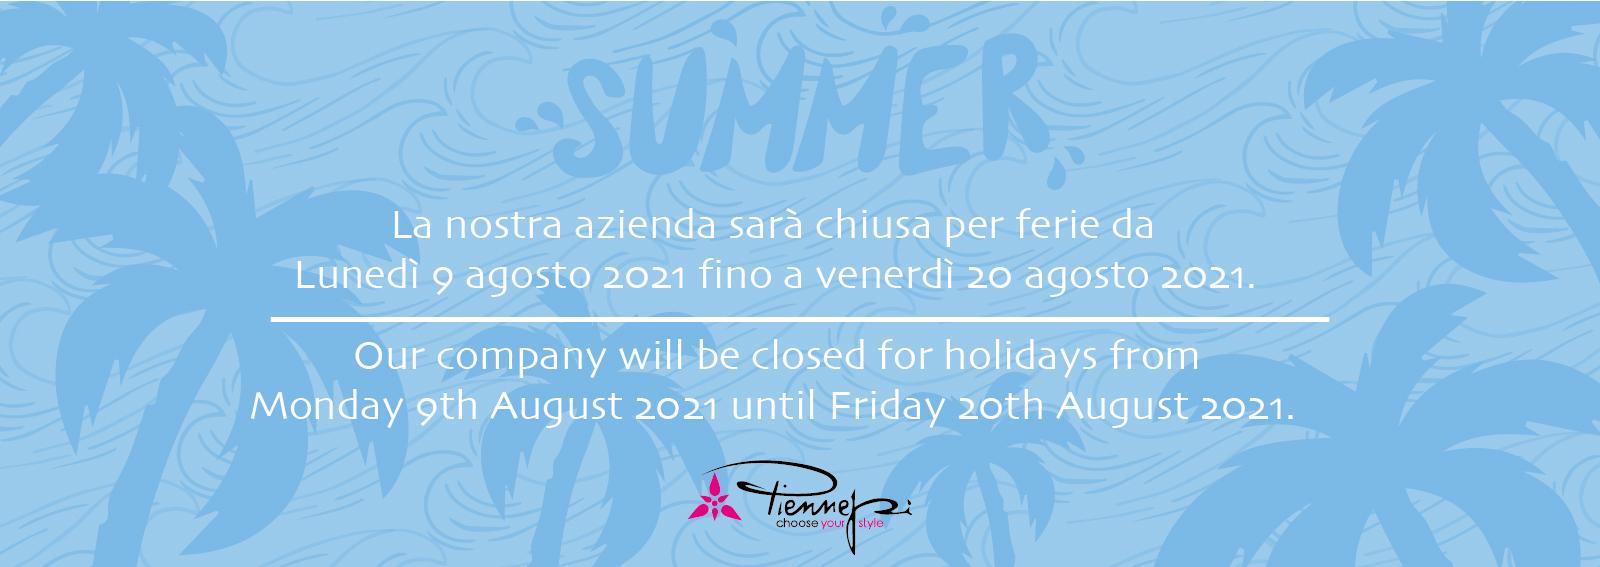 banner ferie estate-01